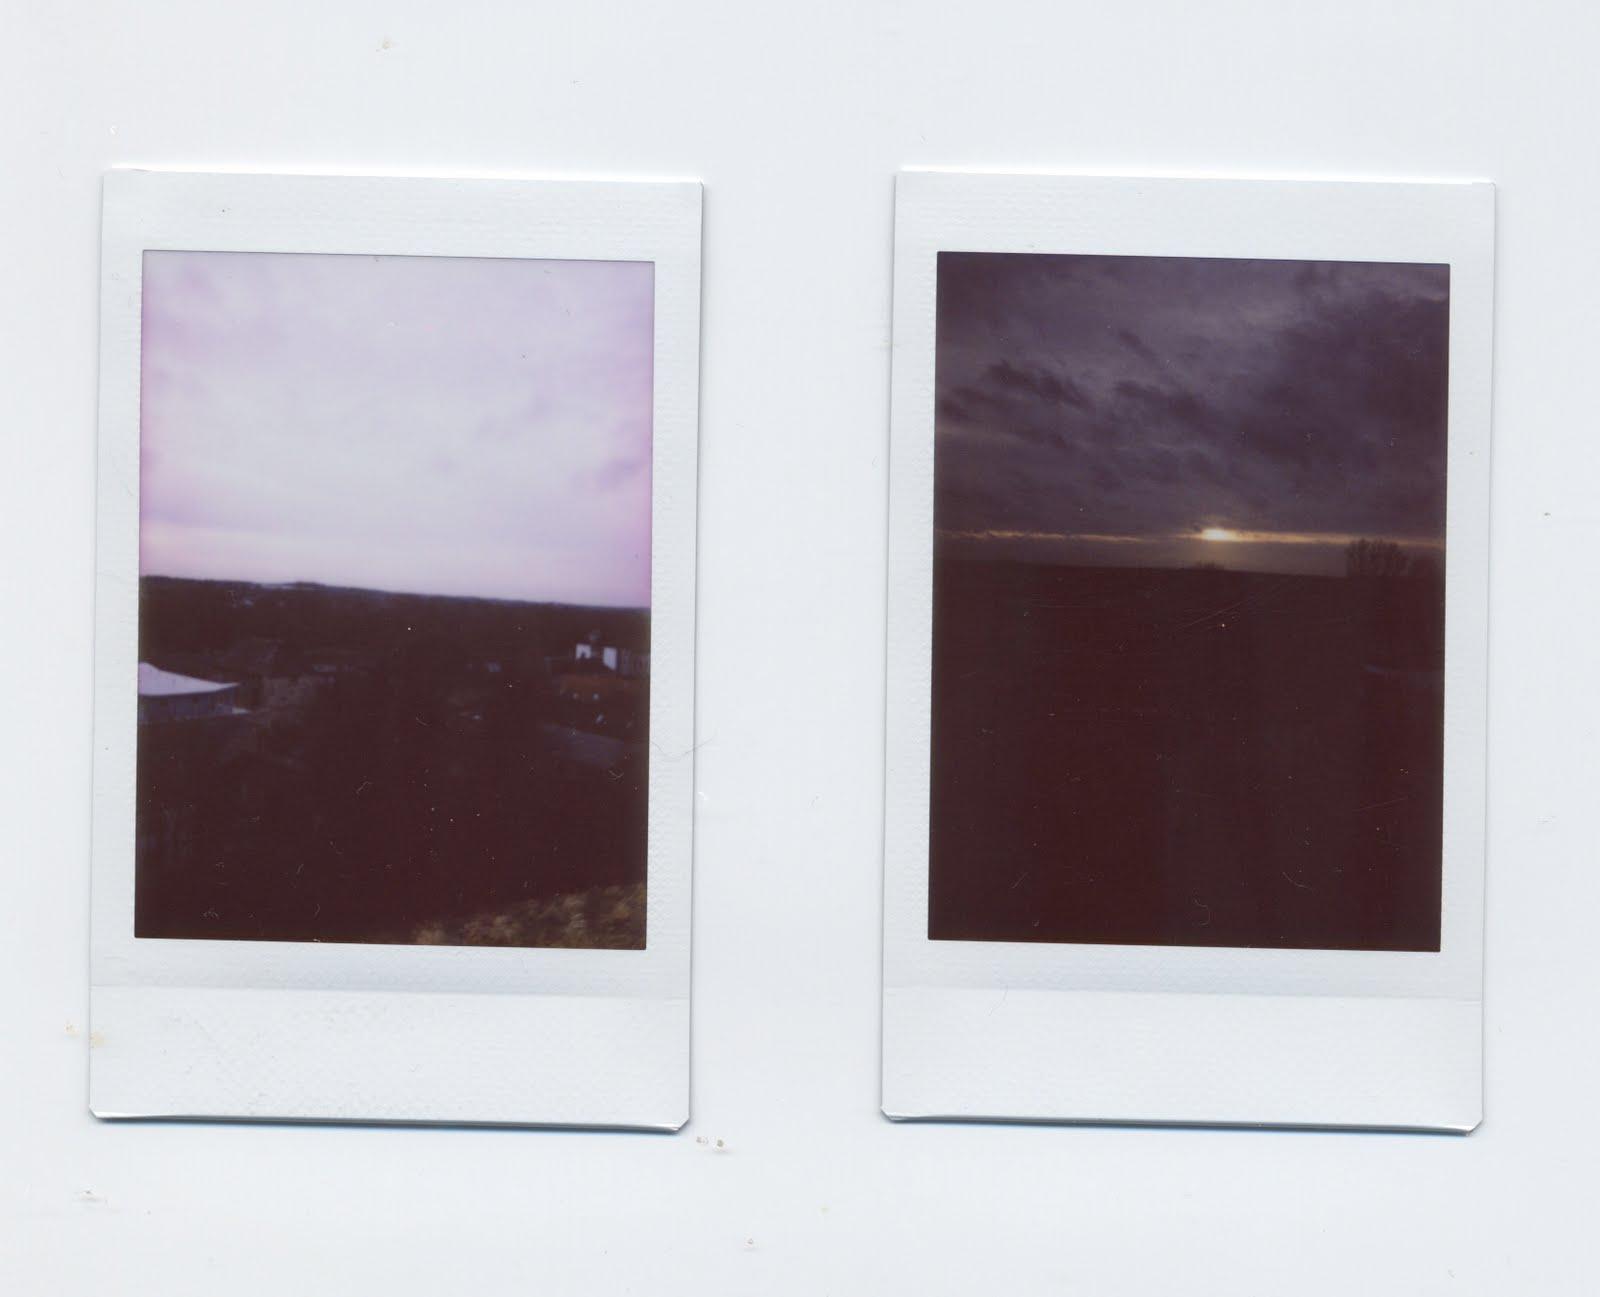 Großartig Heimwerker Polaroid Rahmen Fotos - Rahmen Ideen ...